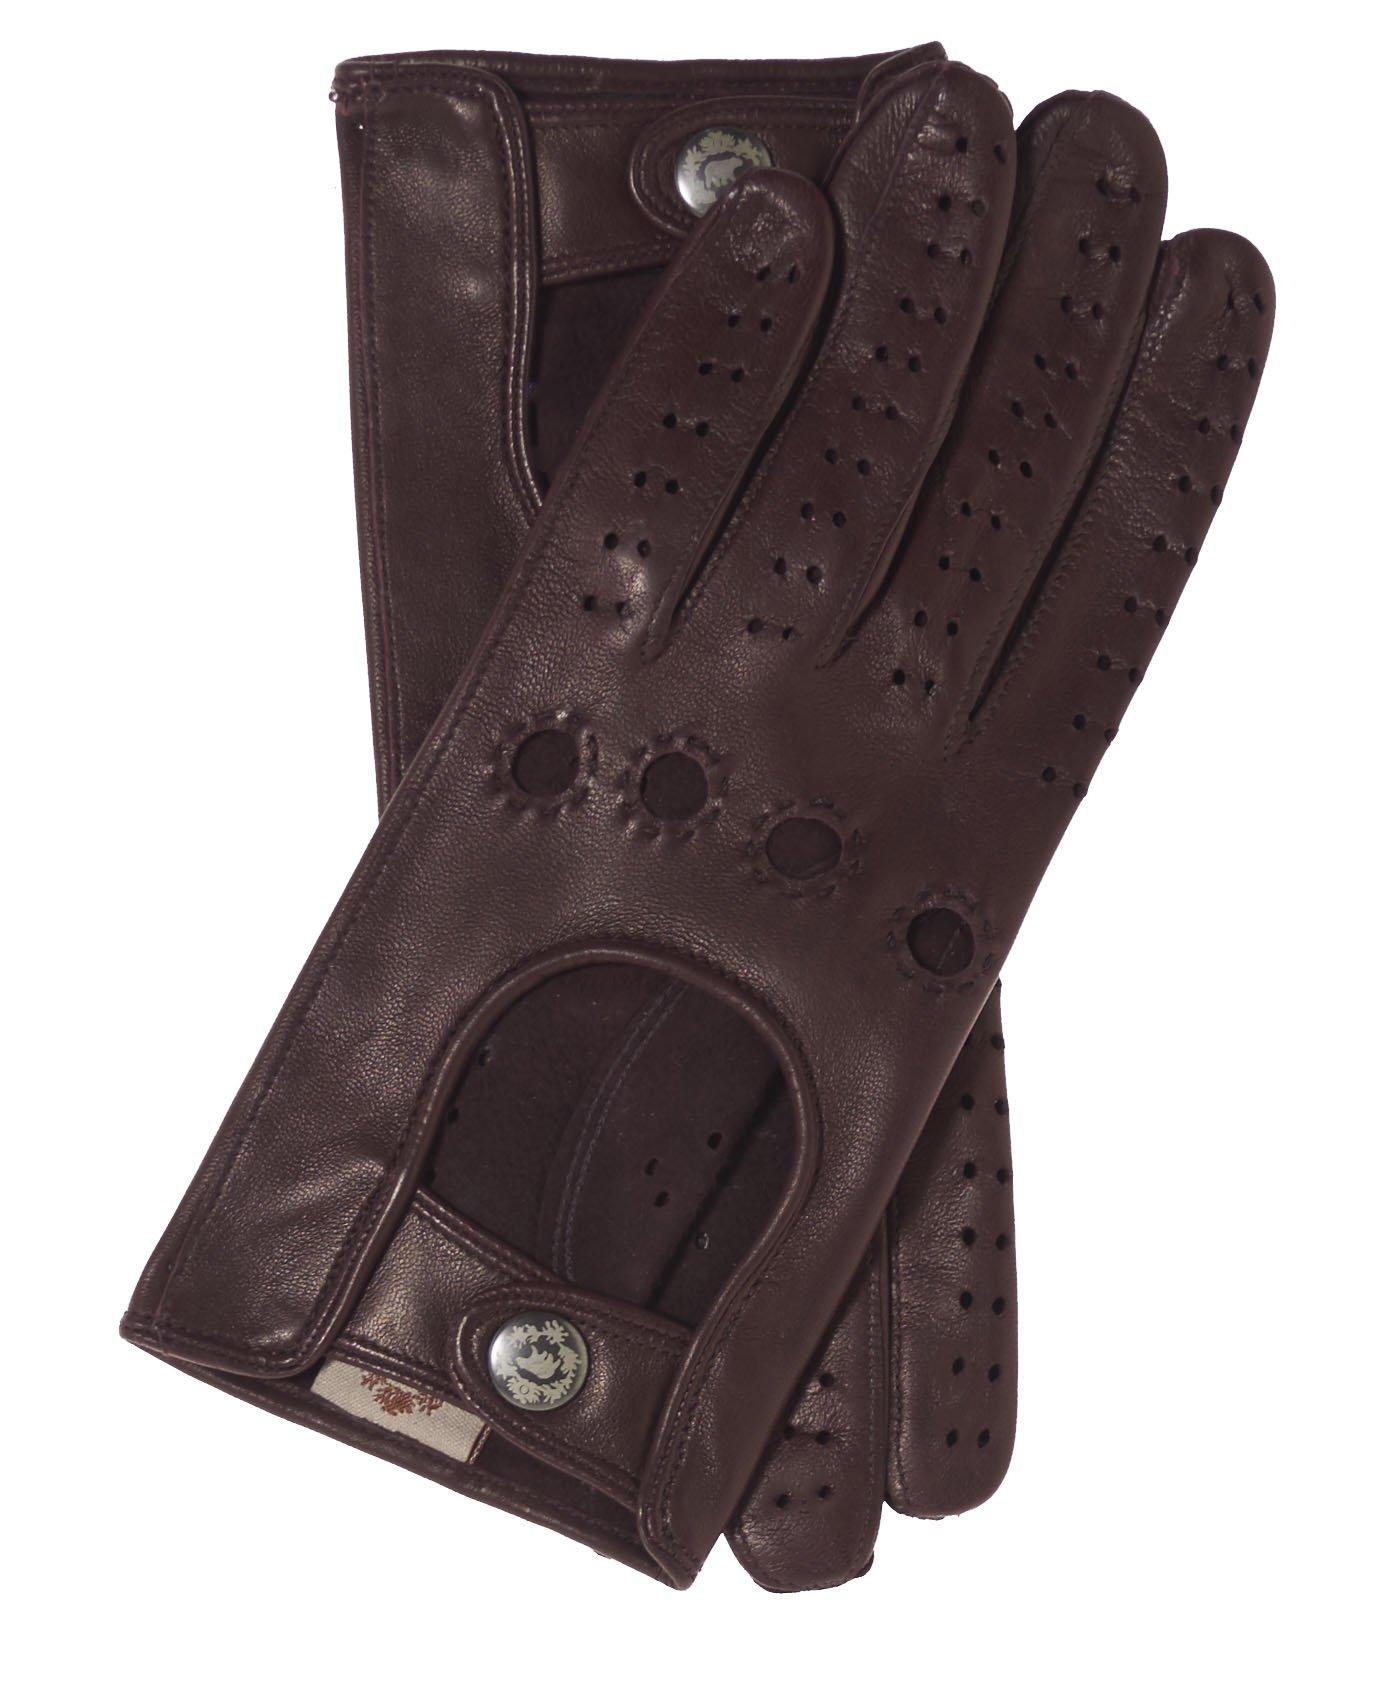 Fratelli Orsini Women's Italian Leather Driving Gloves Size 6 1/2 Color Cordovan